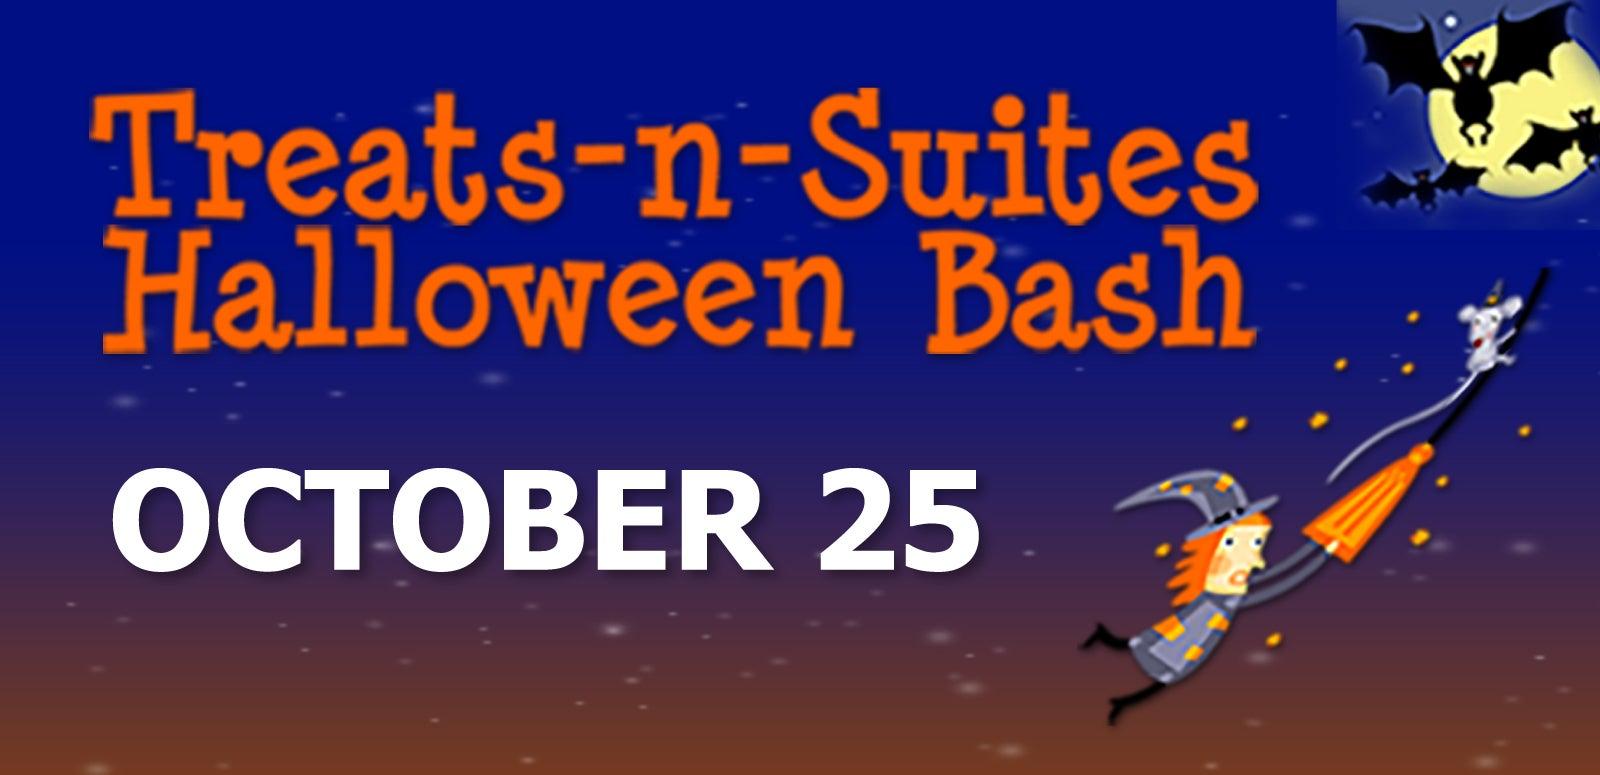 Treats-n-Suites Halloween Bash